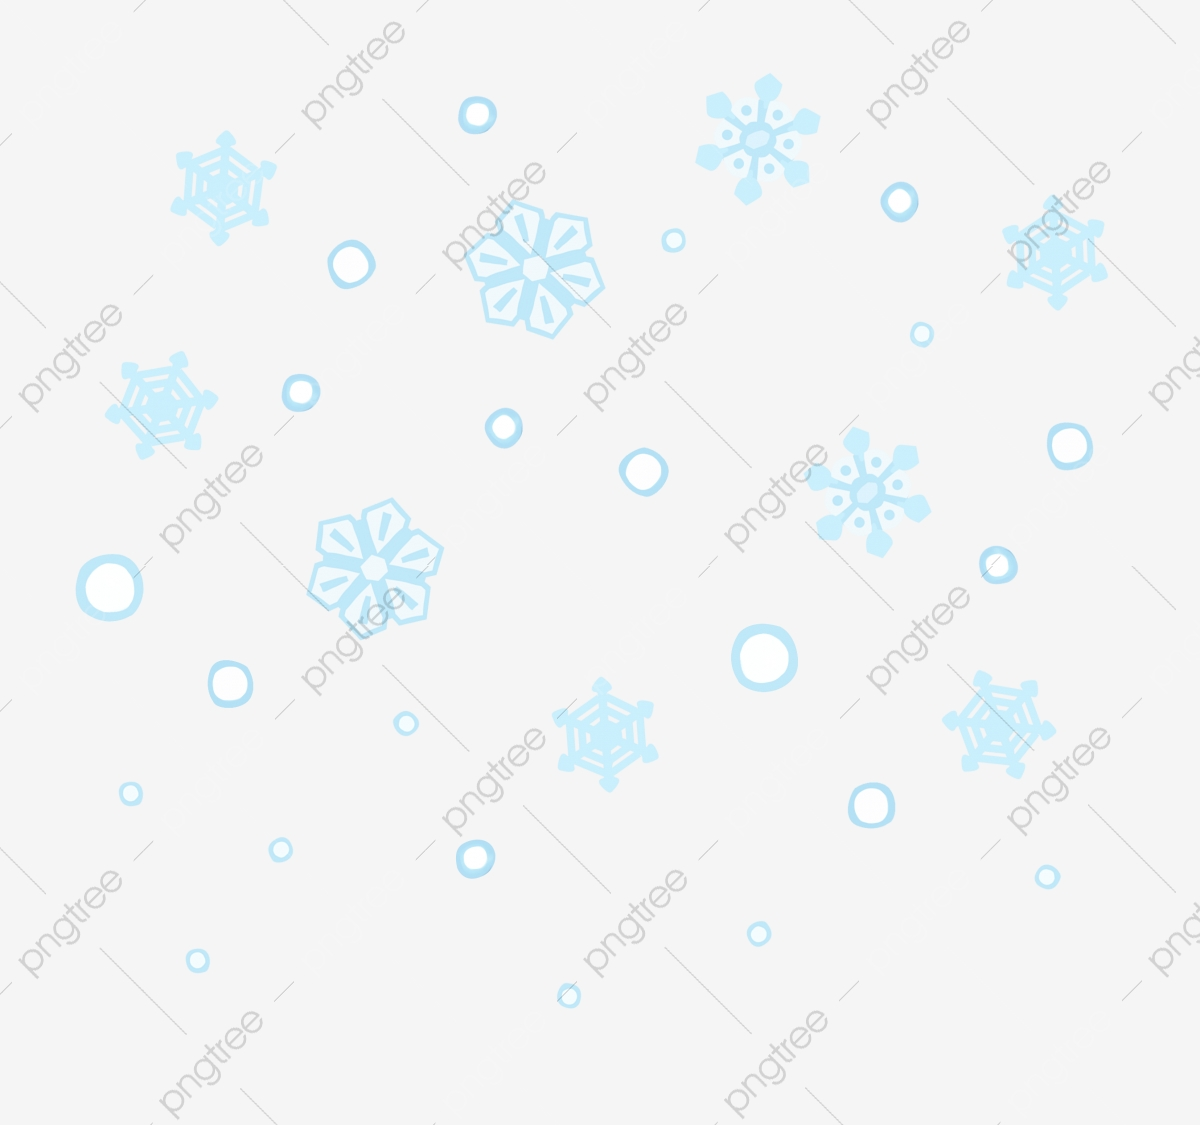 Snow Snowflake Falling Christmas, Winter, Christmas, Snow Drifting.